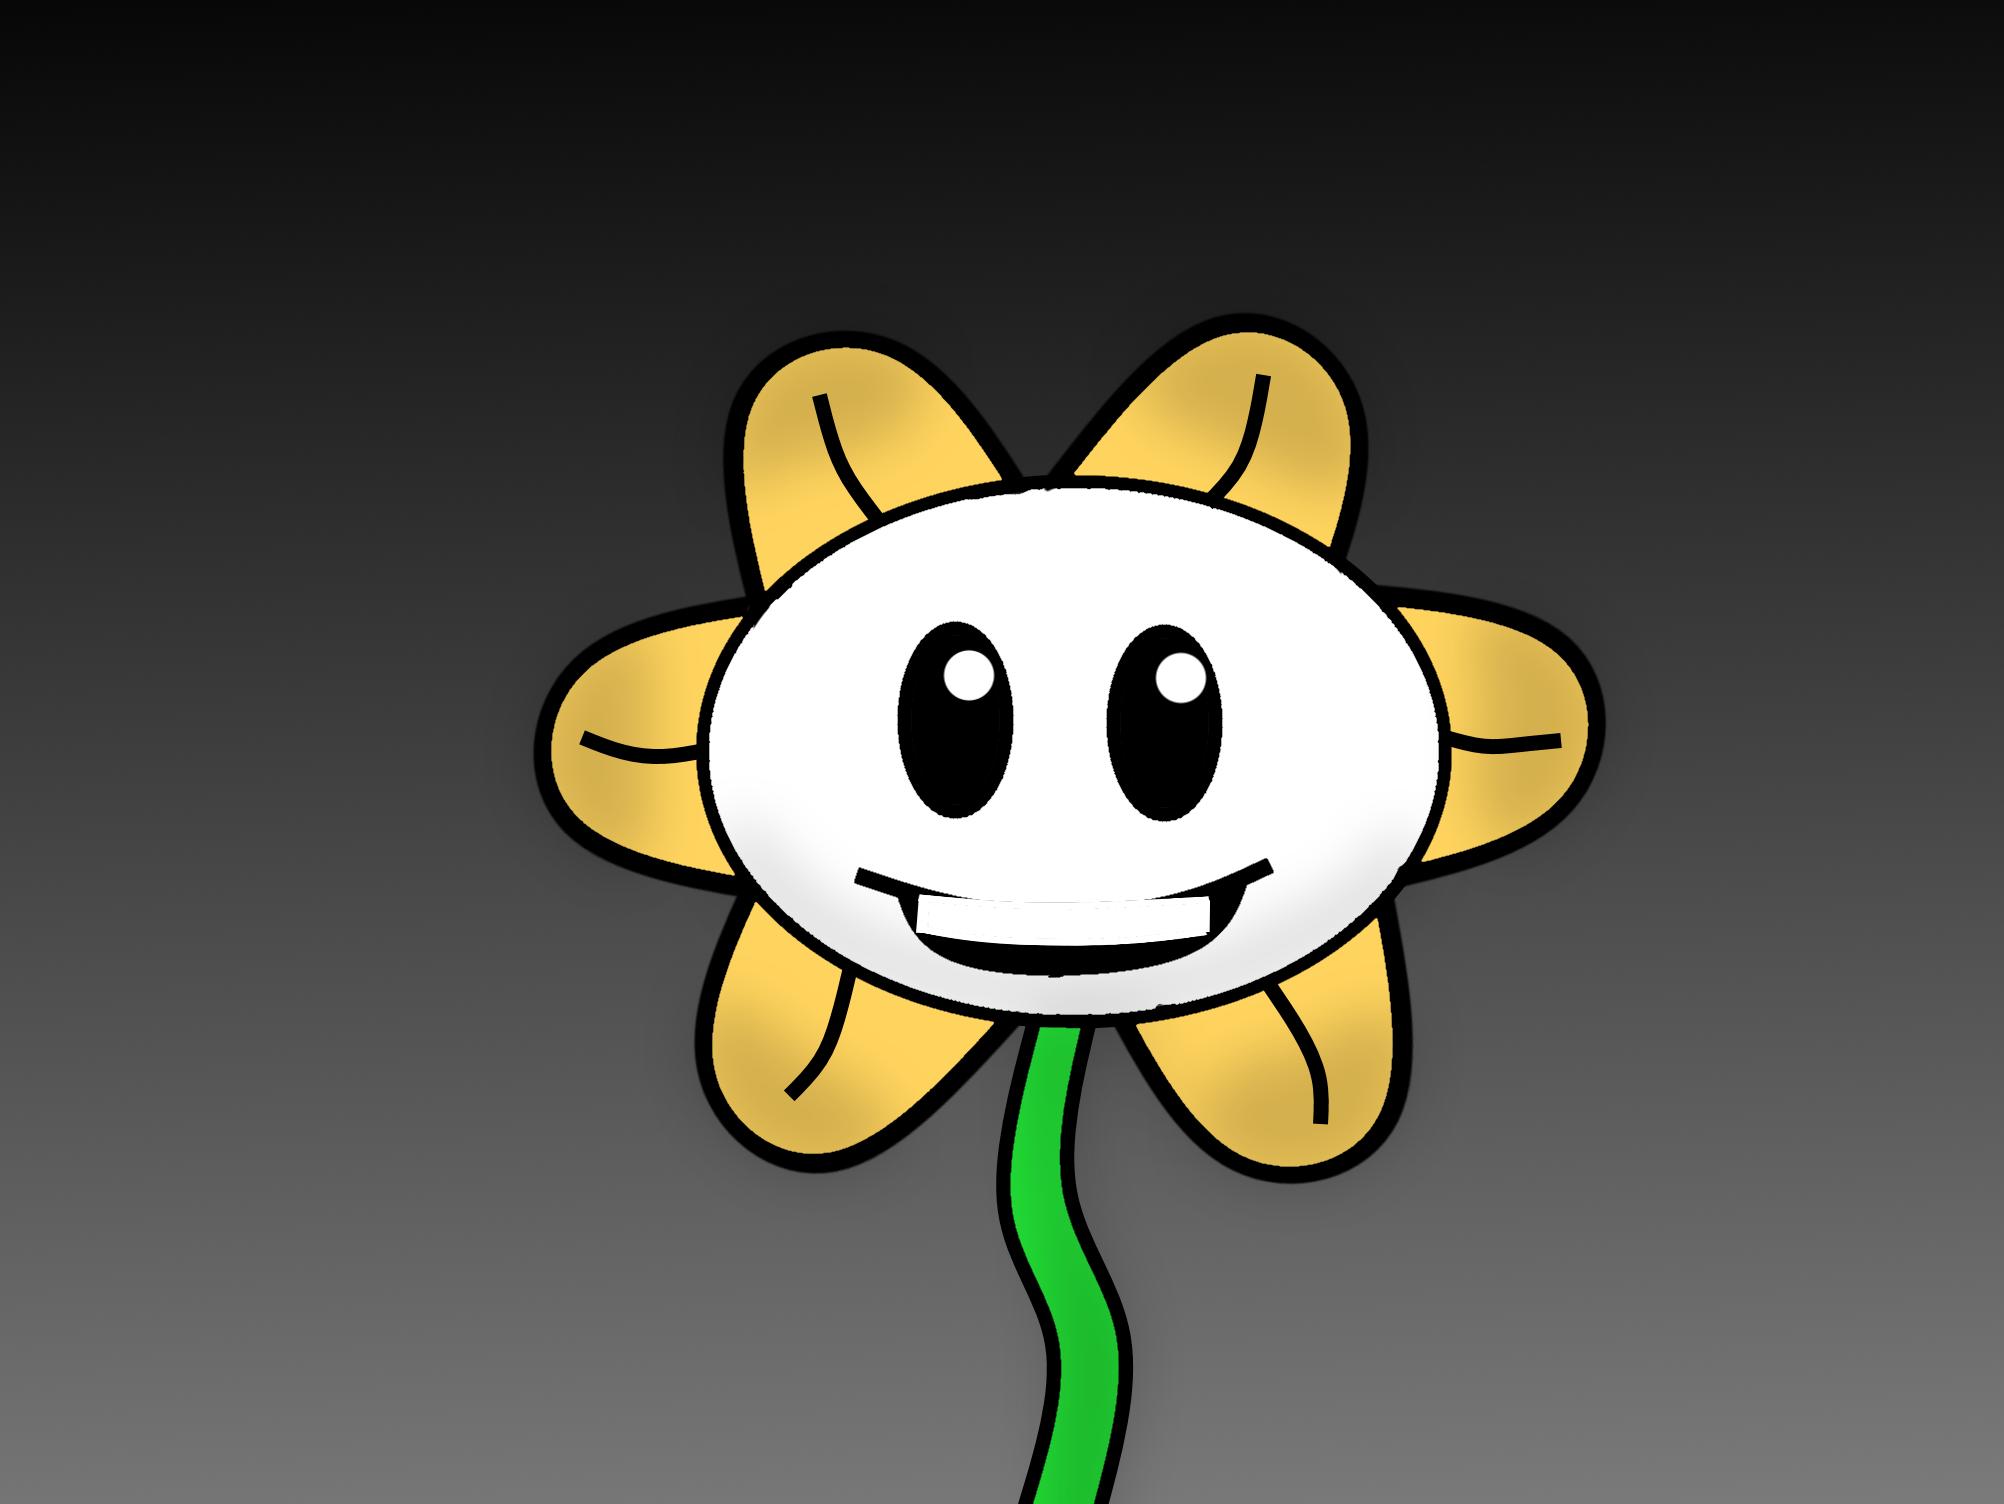 Undertale Flowey the Flower 02 image theemmy4501 Mod DB